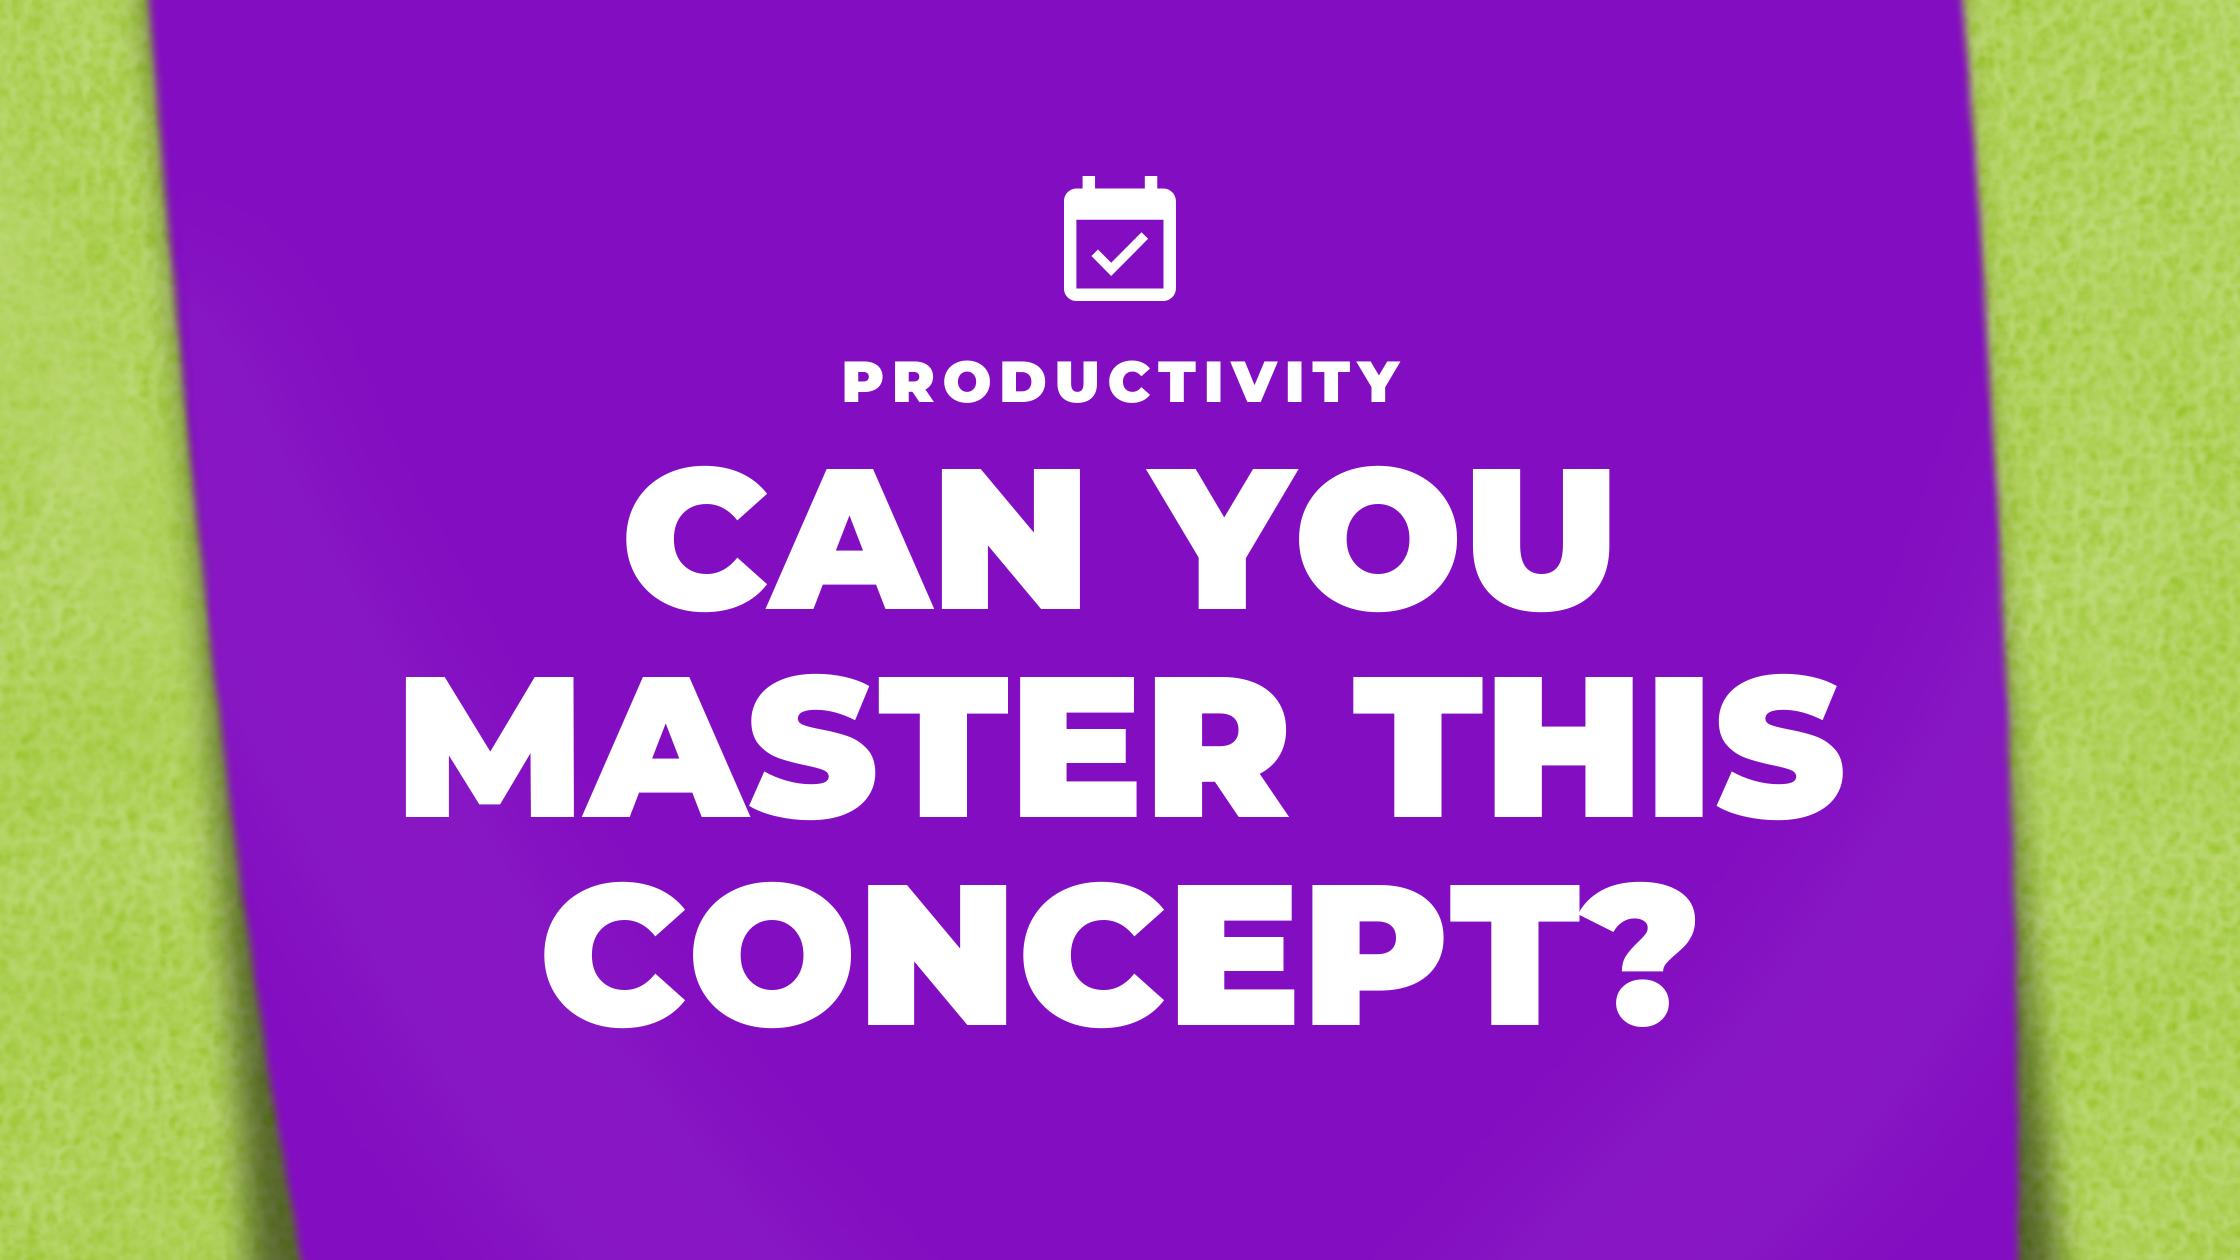 PRODUCTIVITY concept banner